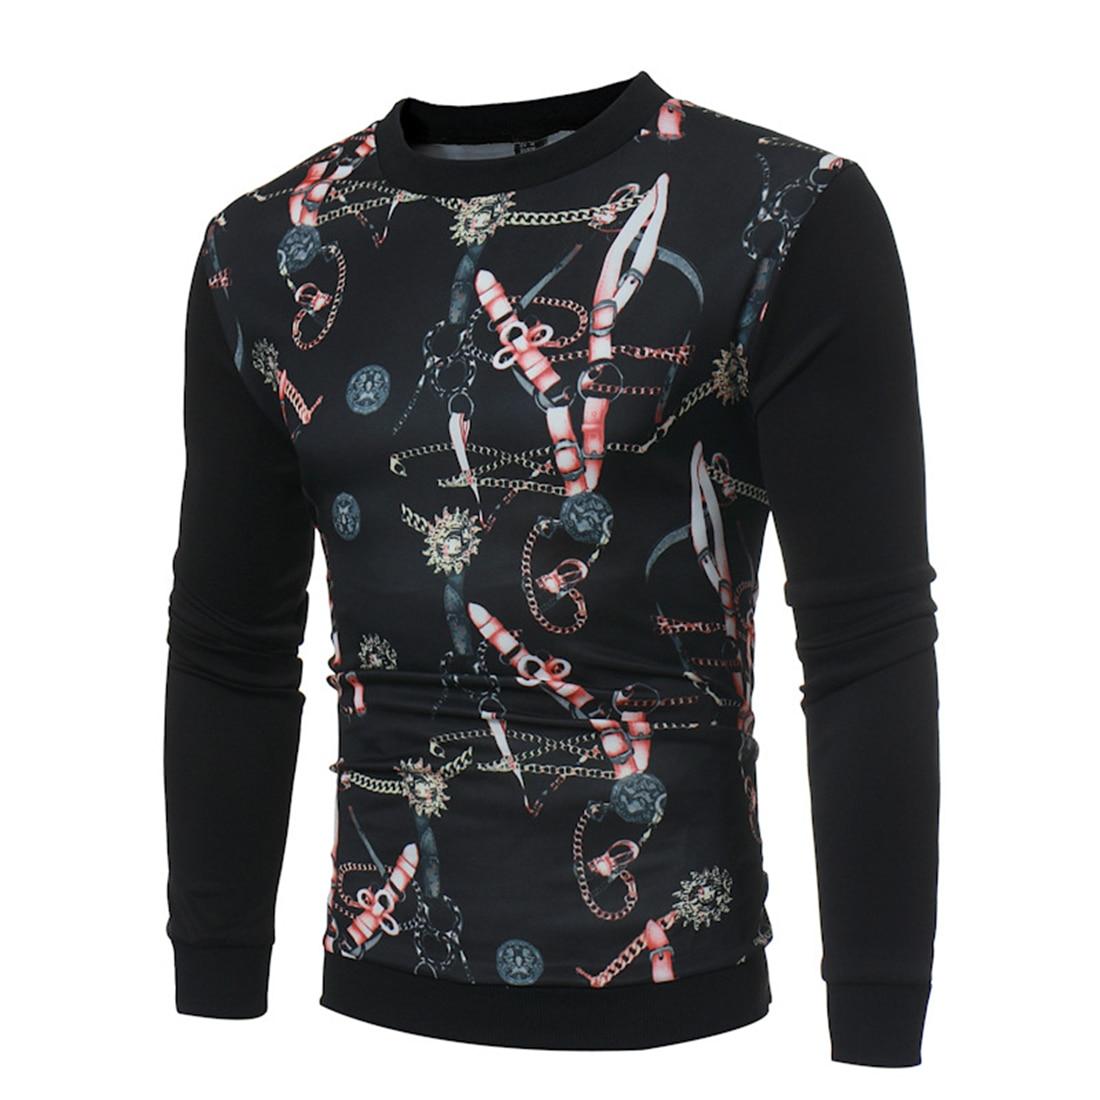 YJ(15) Store Hoodies Men's Long Sleeve Autumn Winter Sweats Crewneck Tops Sportswear Sweat 3D Floral Sweatshirts Print Tops Hoody Round Nick